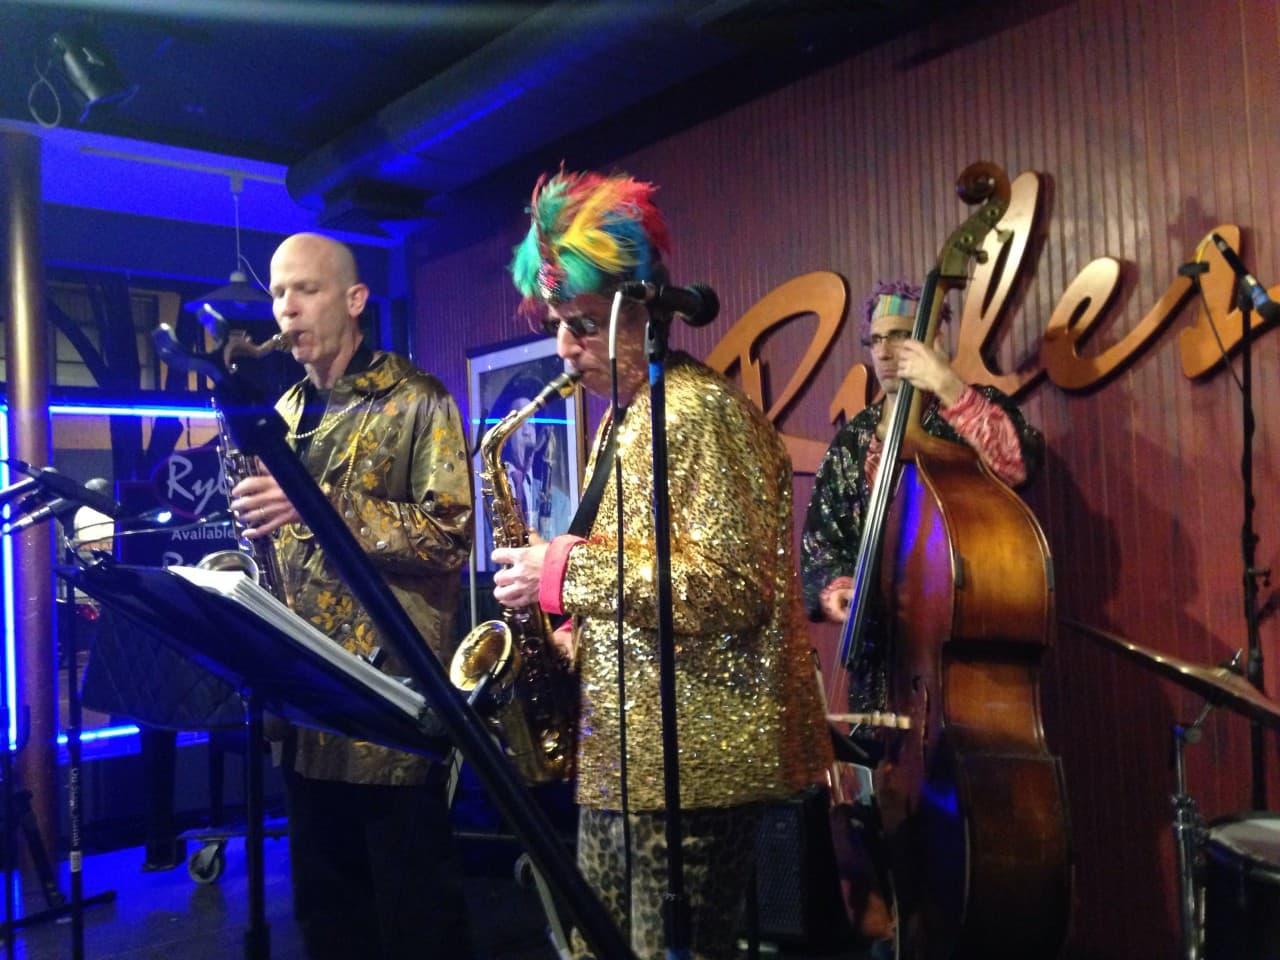 Tom Hall, Ken Field and Blake Newman of Revolutionary Snake Ensemble play at Ryles Jazz Club in Cambridge, Mass. (WBUR/Kathleen McNerney)